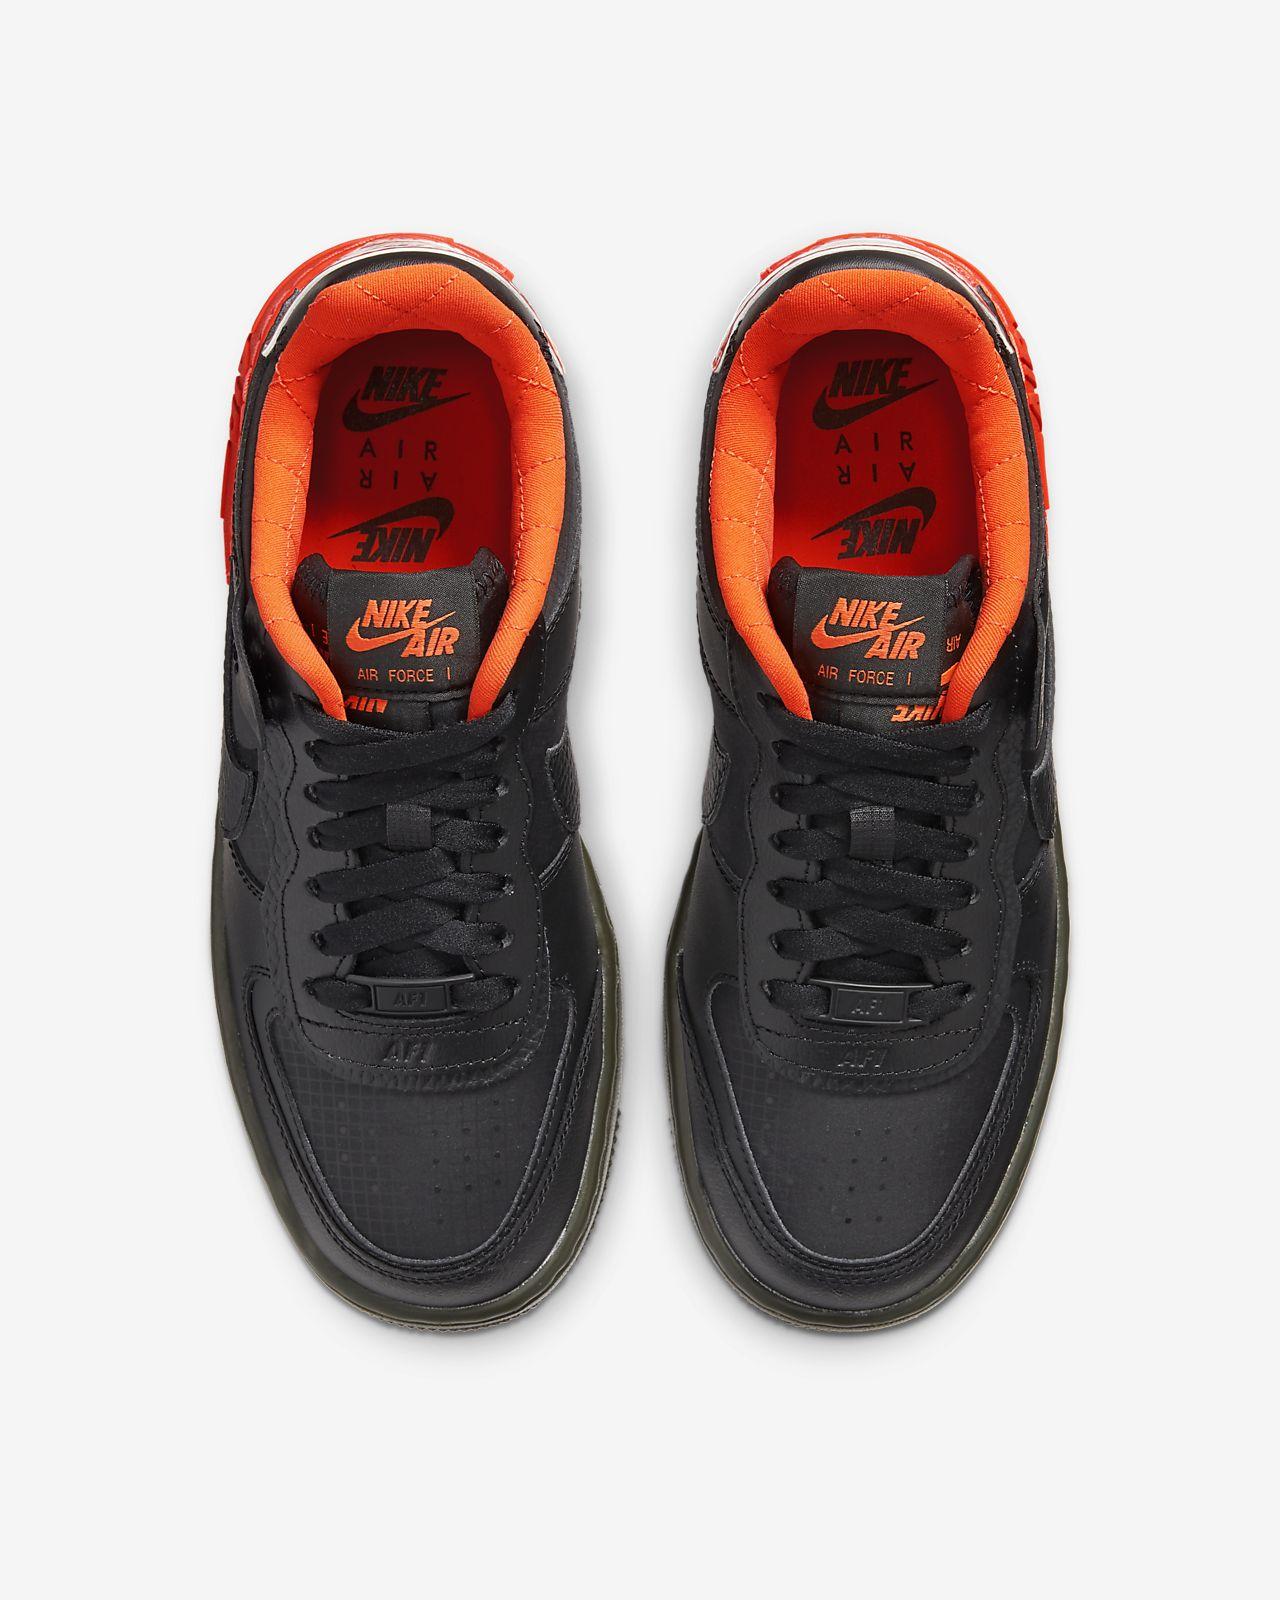 Nike Air Max 97 Pure Platinum University Red KicksOnFire